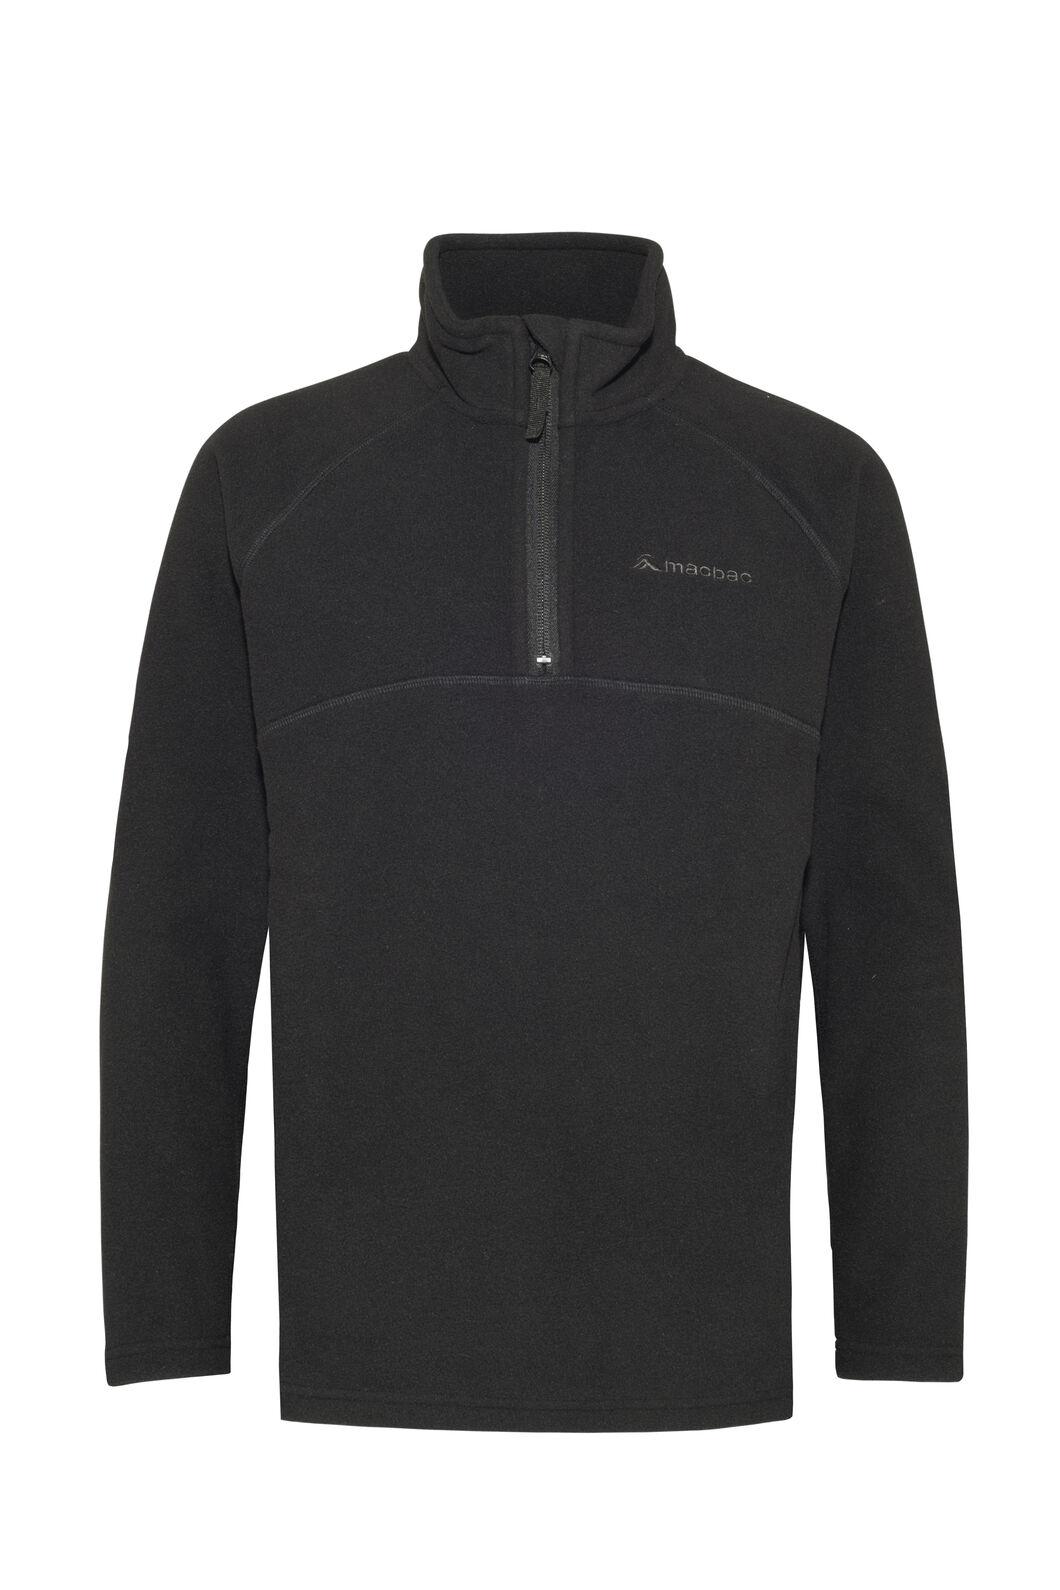 Macpac Tui Polartec® Fleece Pullover — Kids', Black, hi-res